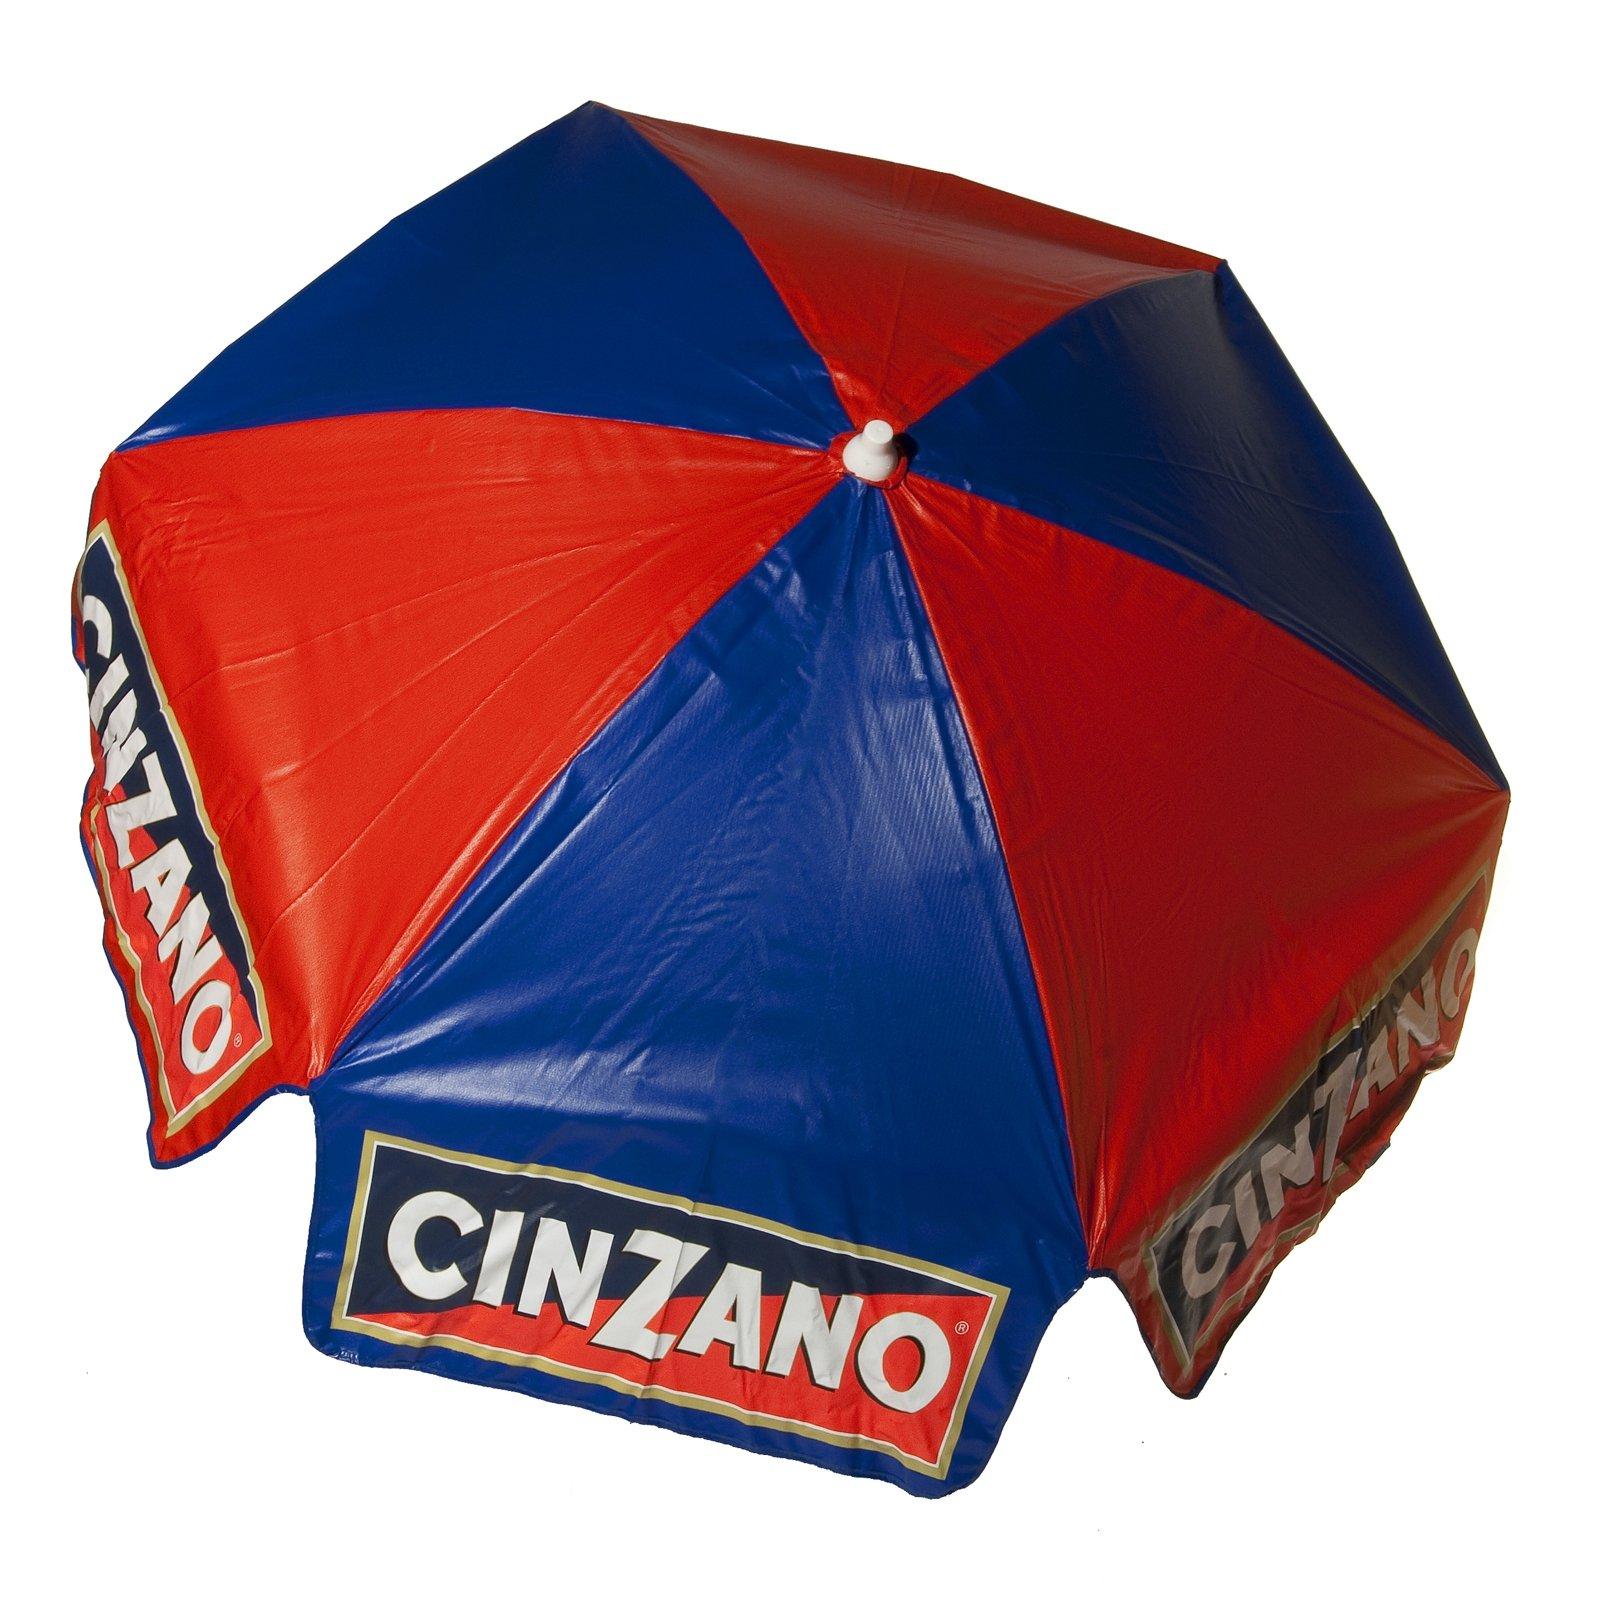 6ft Licensed Cinzano Tilt Patio Outdoor Market Umbrella Home Canopy - Beach Pole